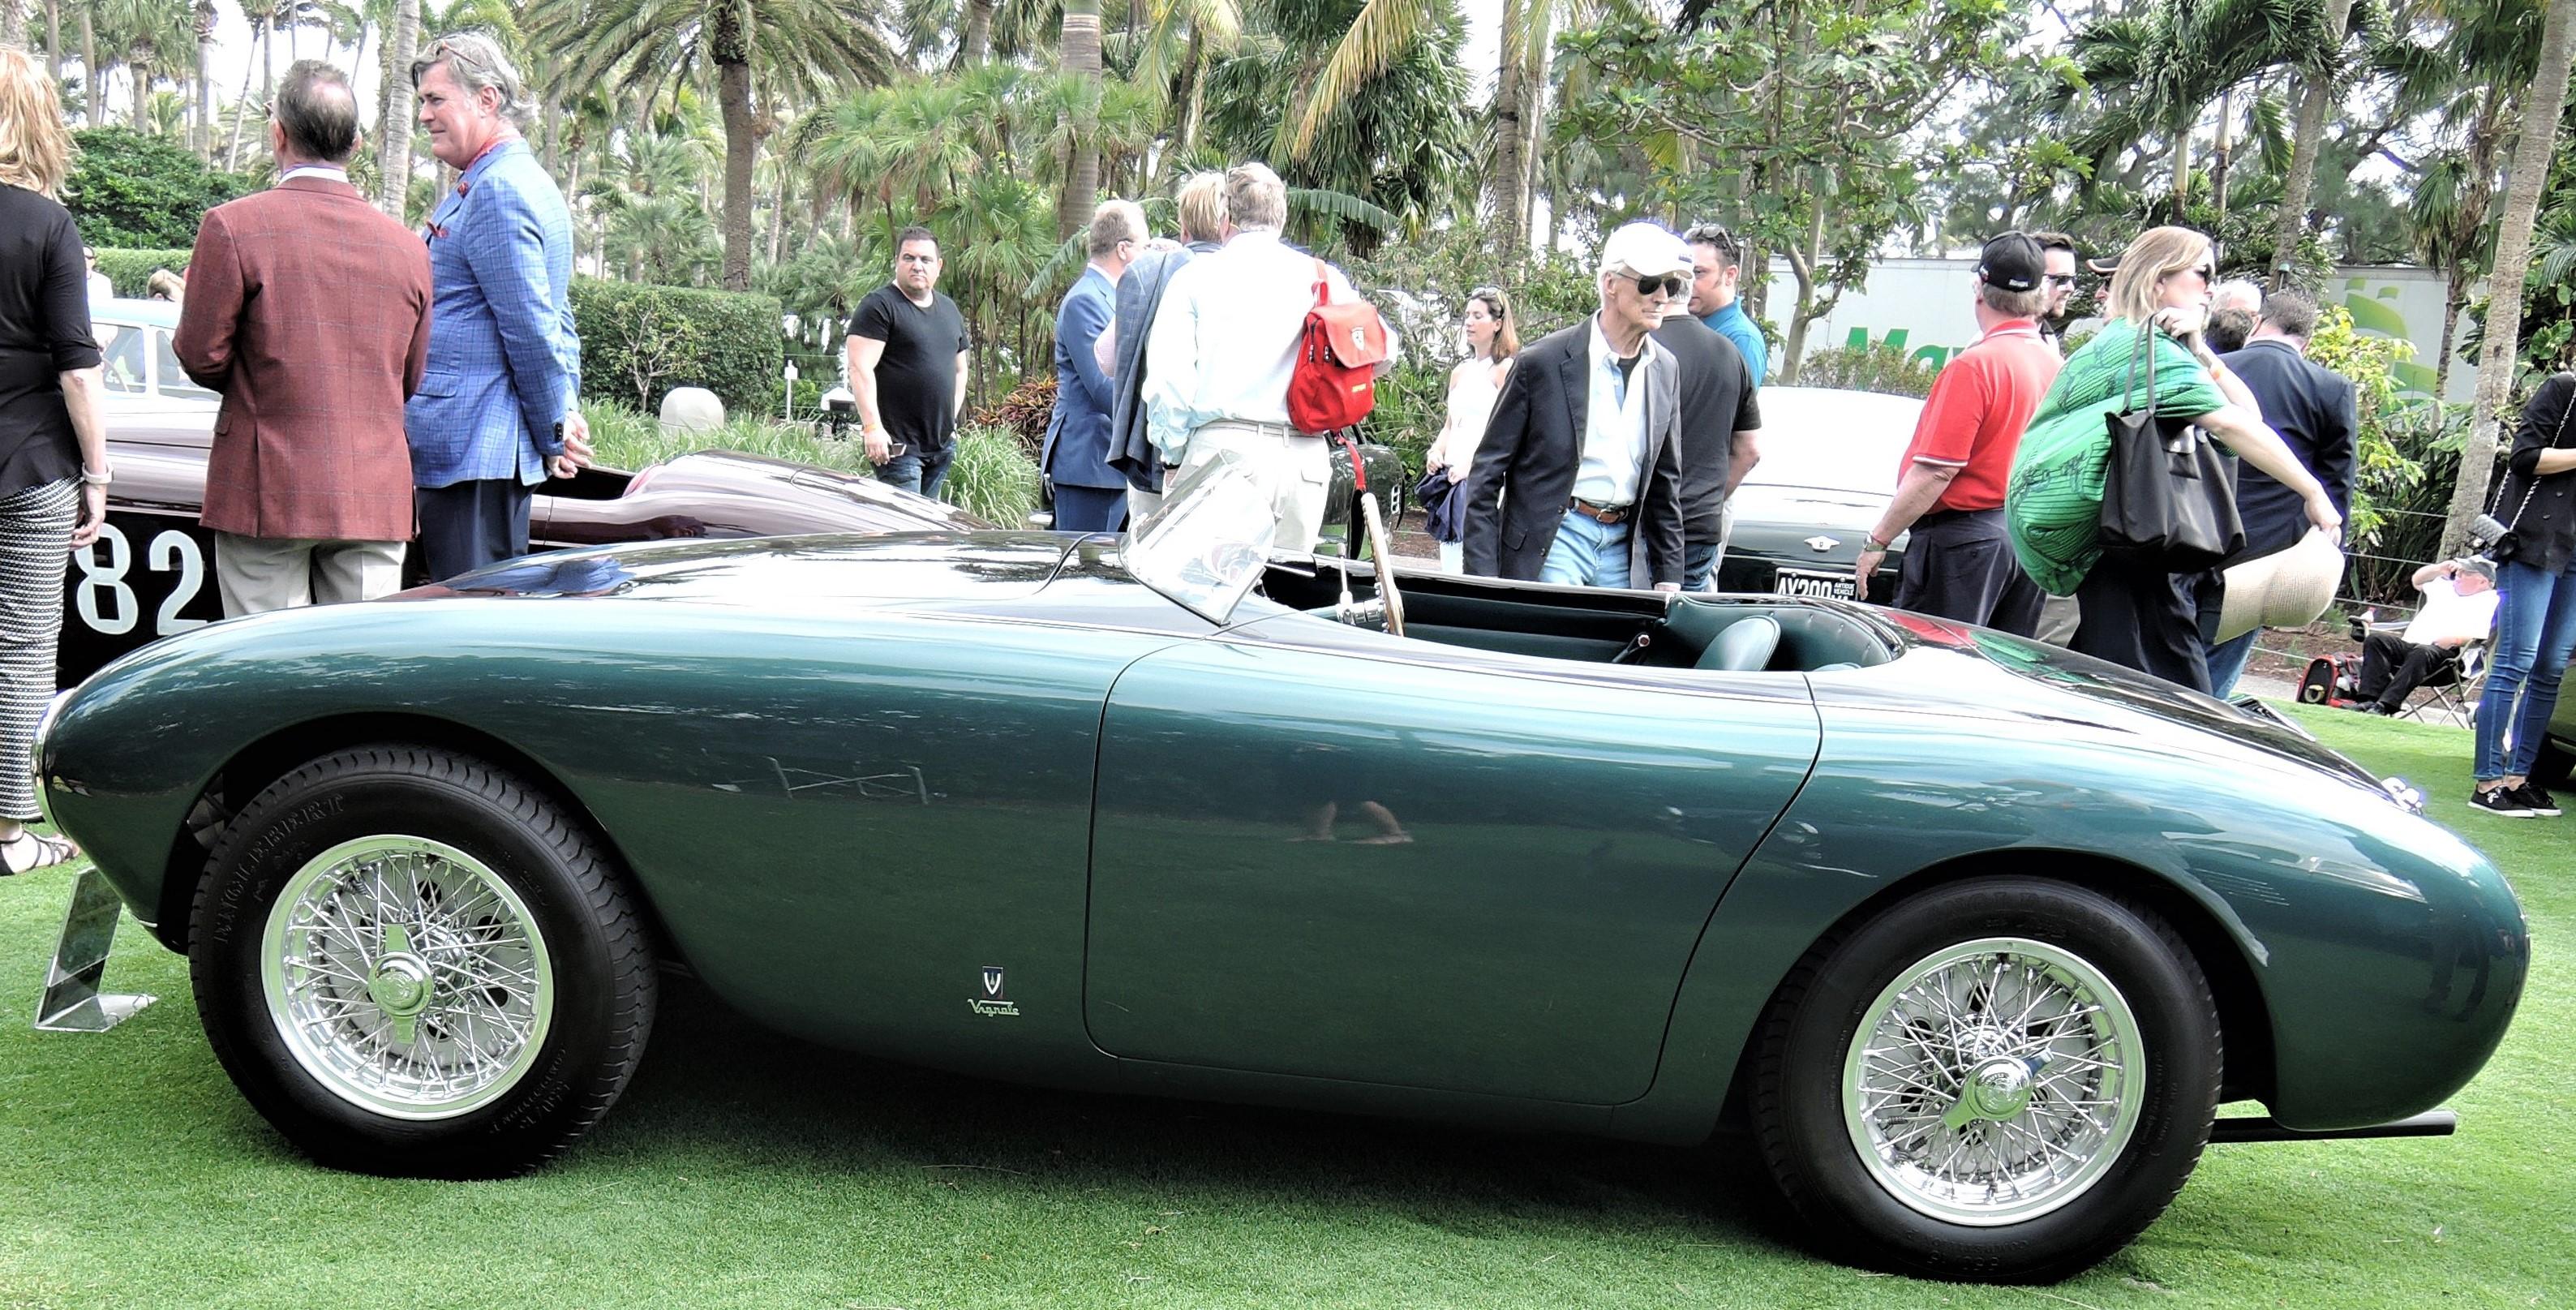 verde green 1951 Ferrari 212 Export Vignale Spyder; Sn 0090 E - Cavallino 2018 Concours